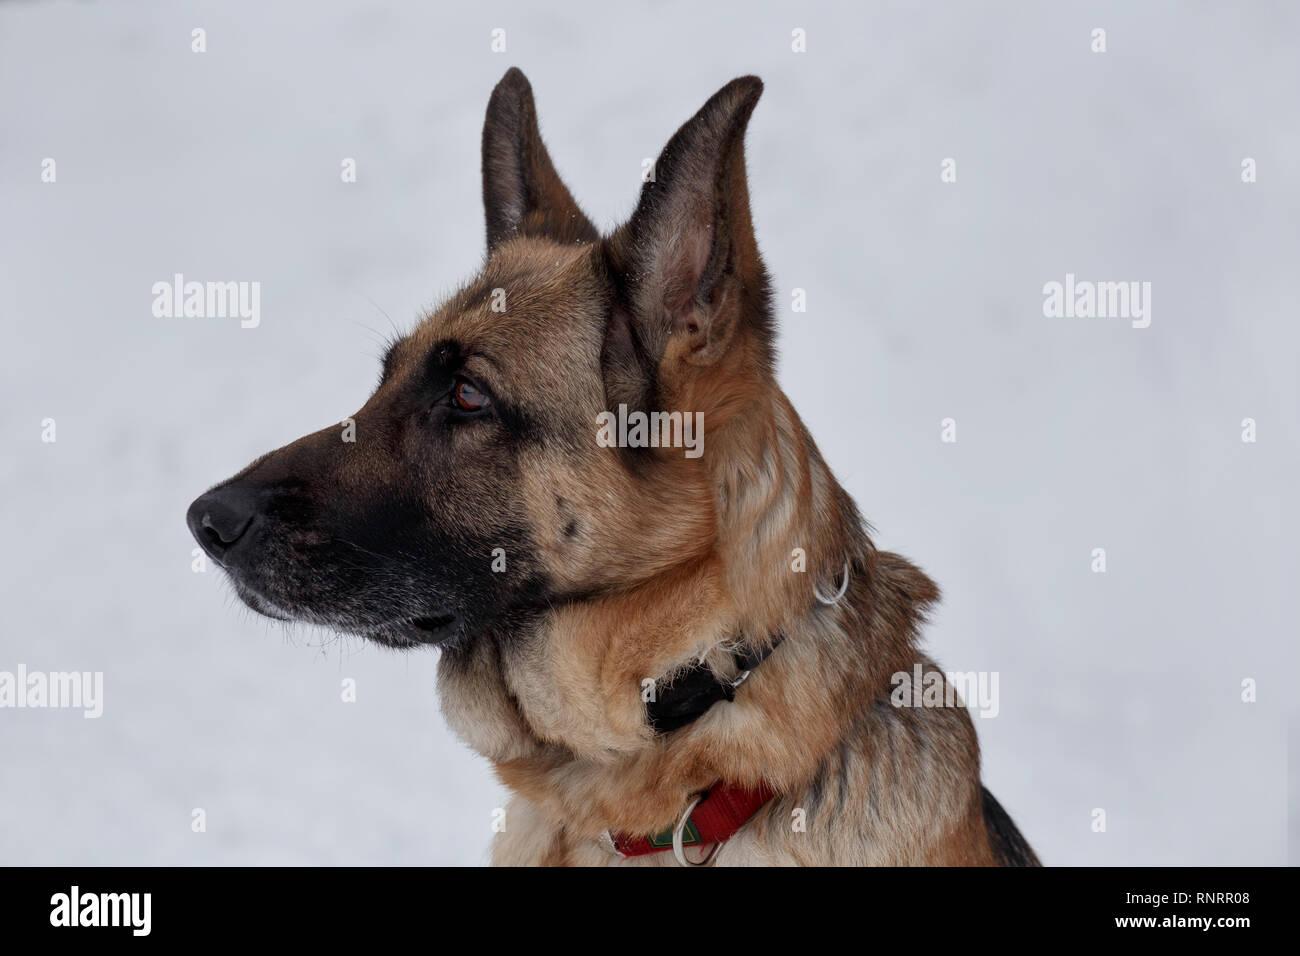 German shepherd with black mask close up. Pet animals. Purebred dog. - Stock Image